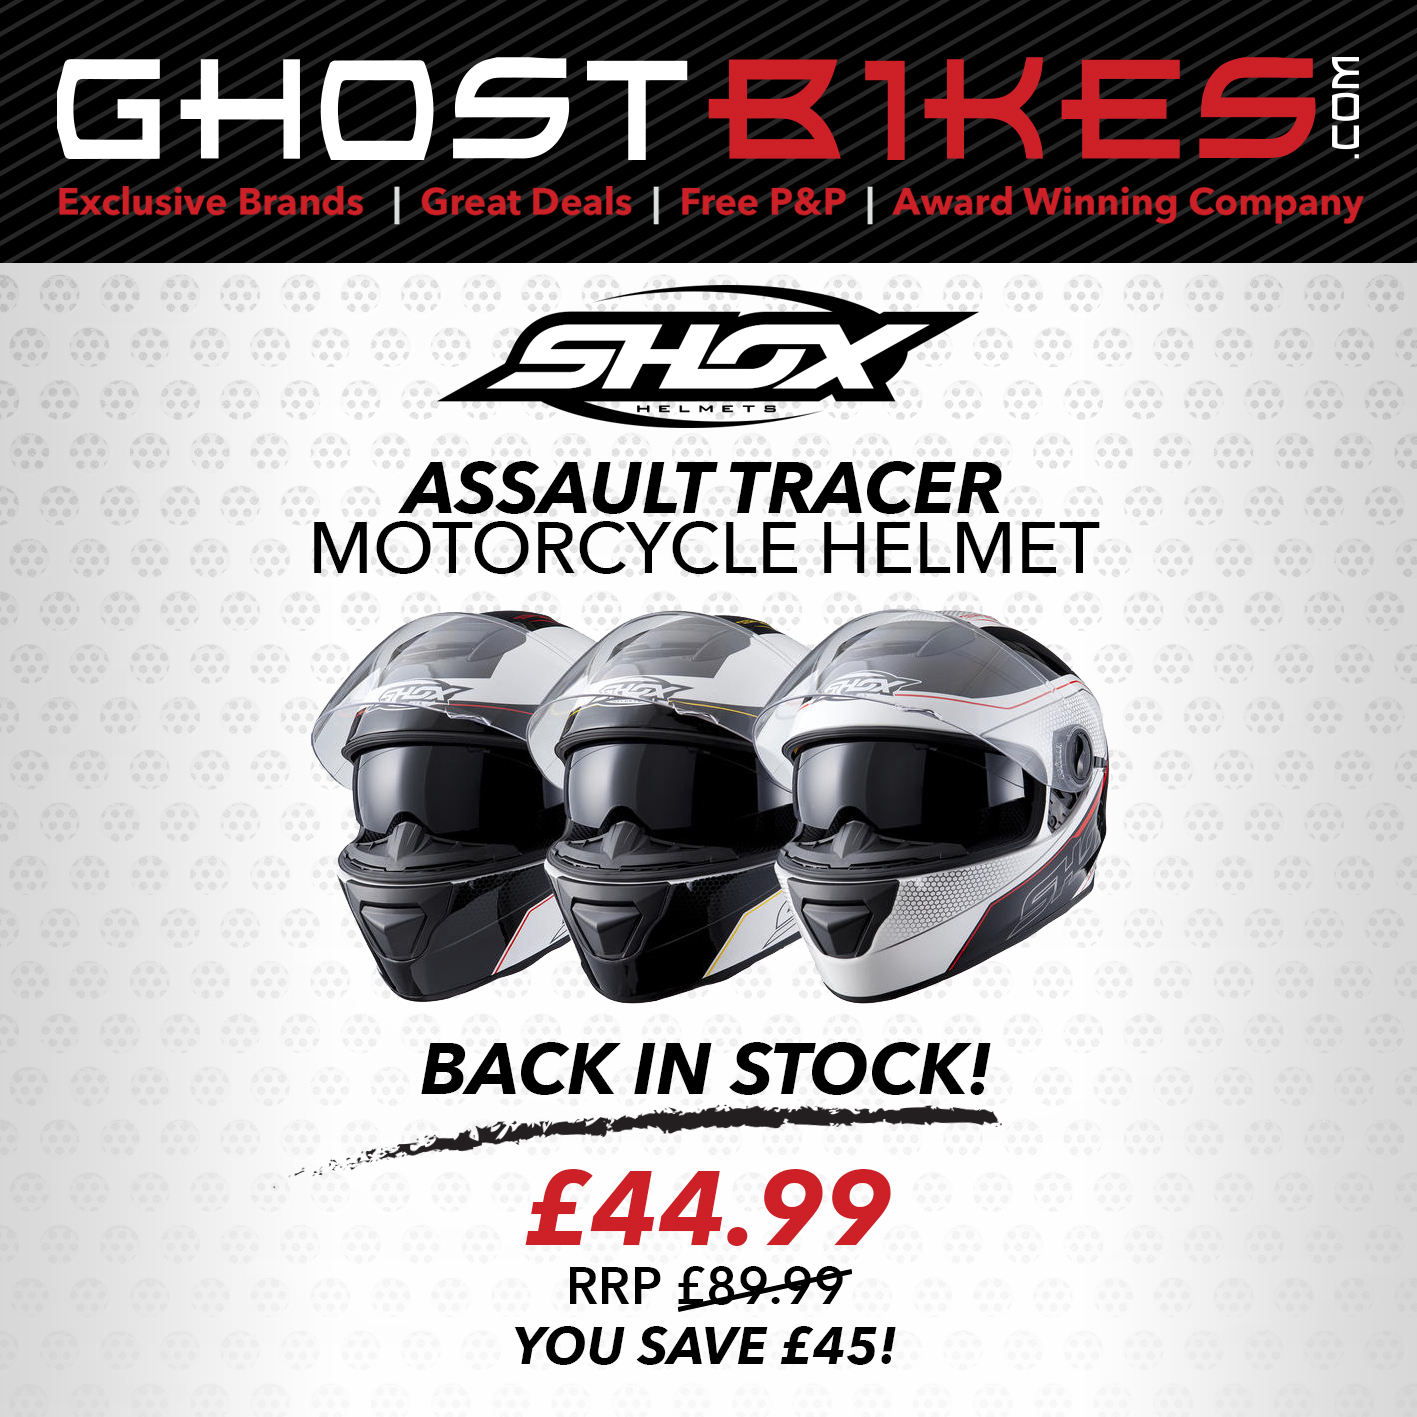 Shox Assault tracer motorcycle Helmet